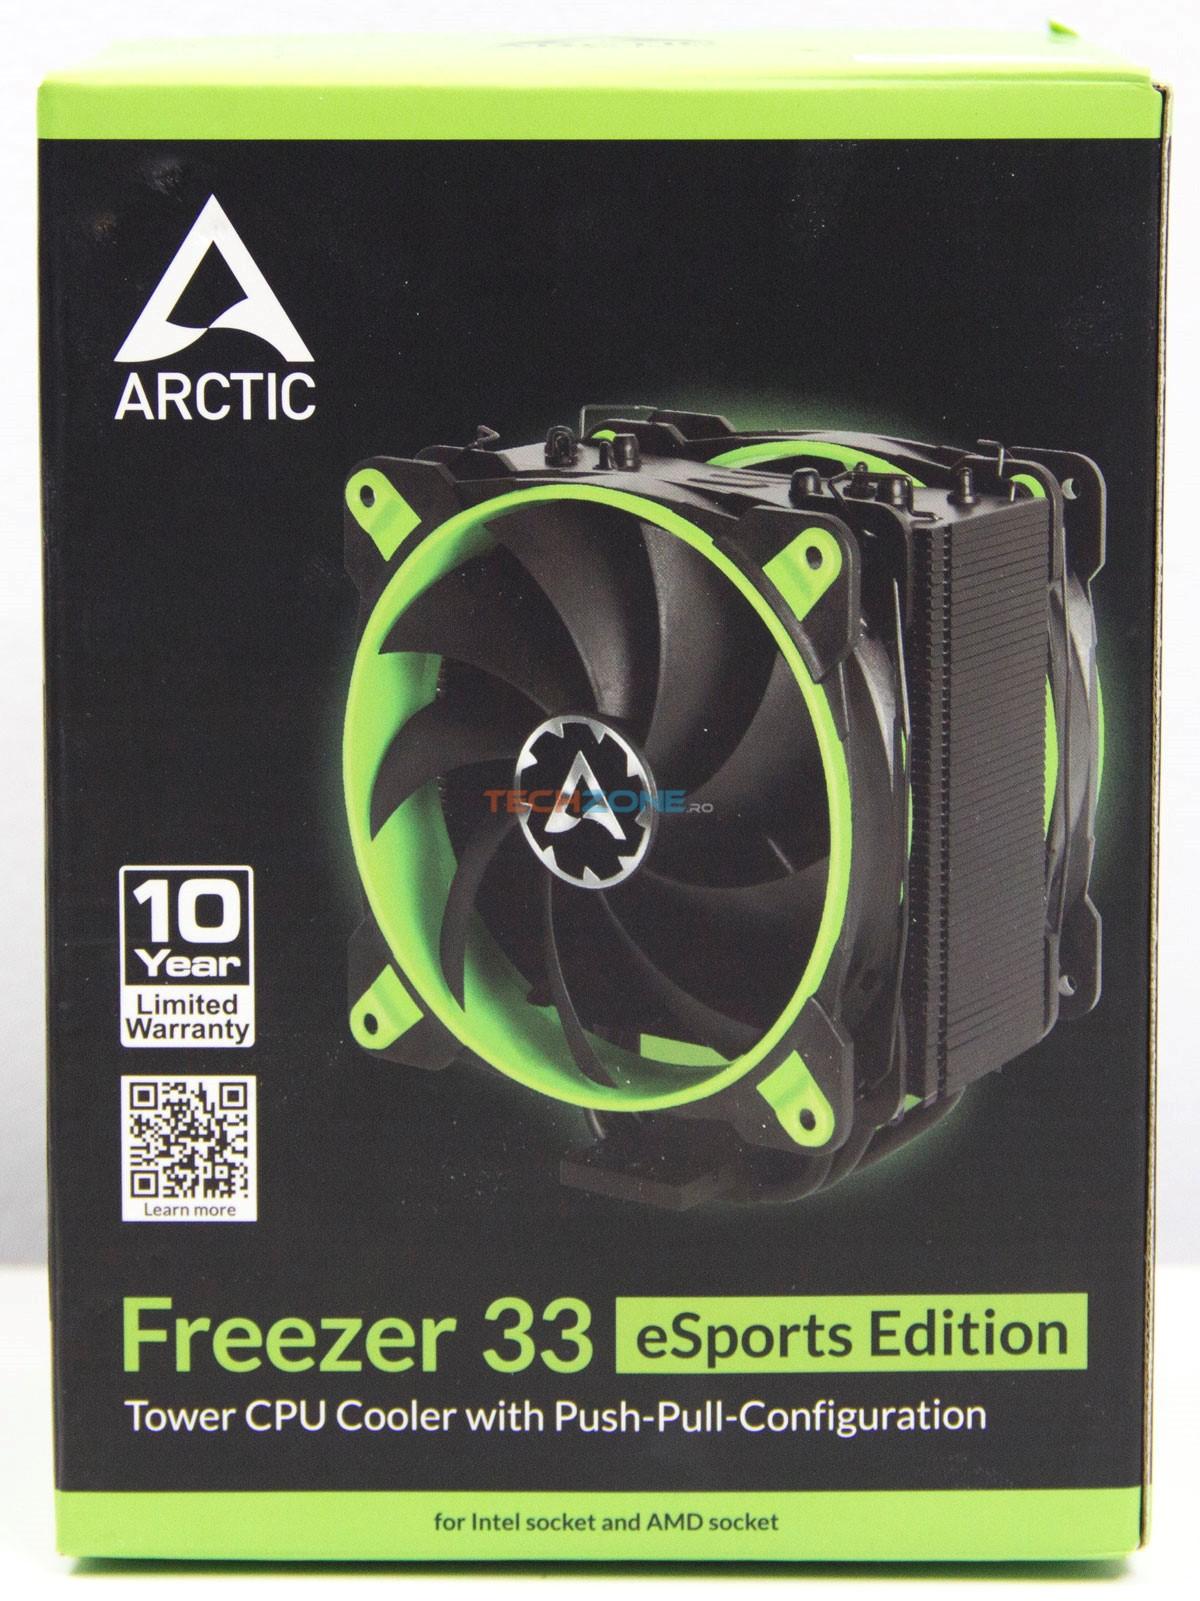 Arctic Freezer33 eSports box